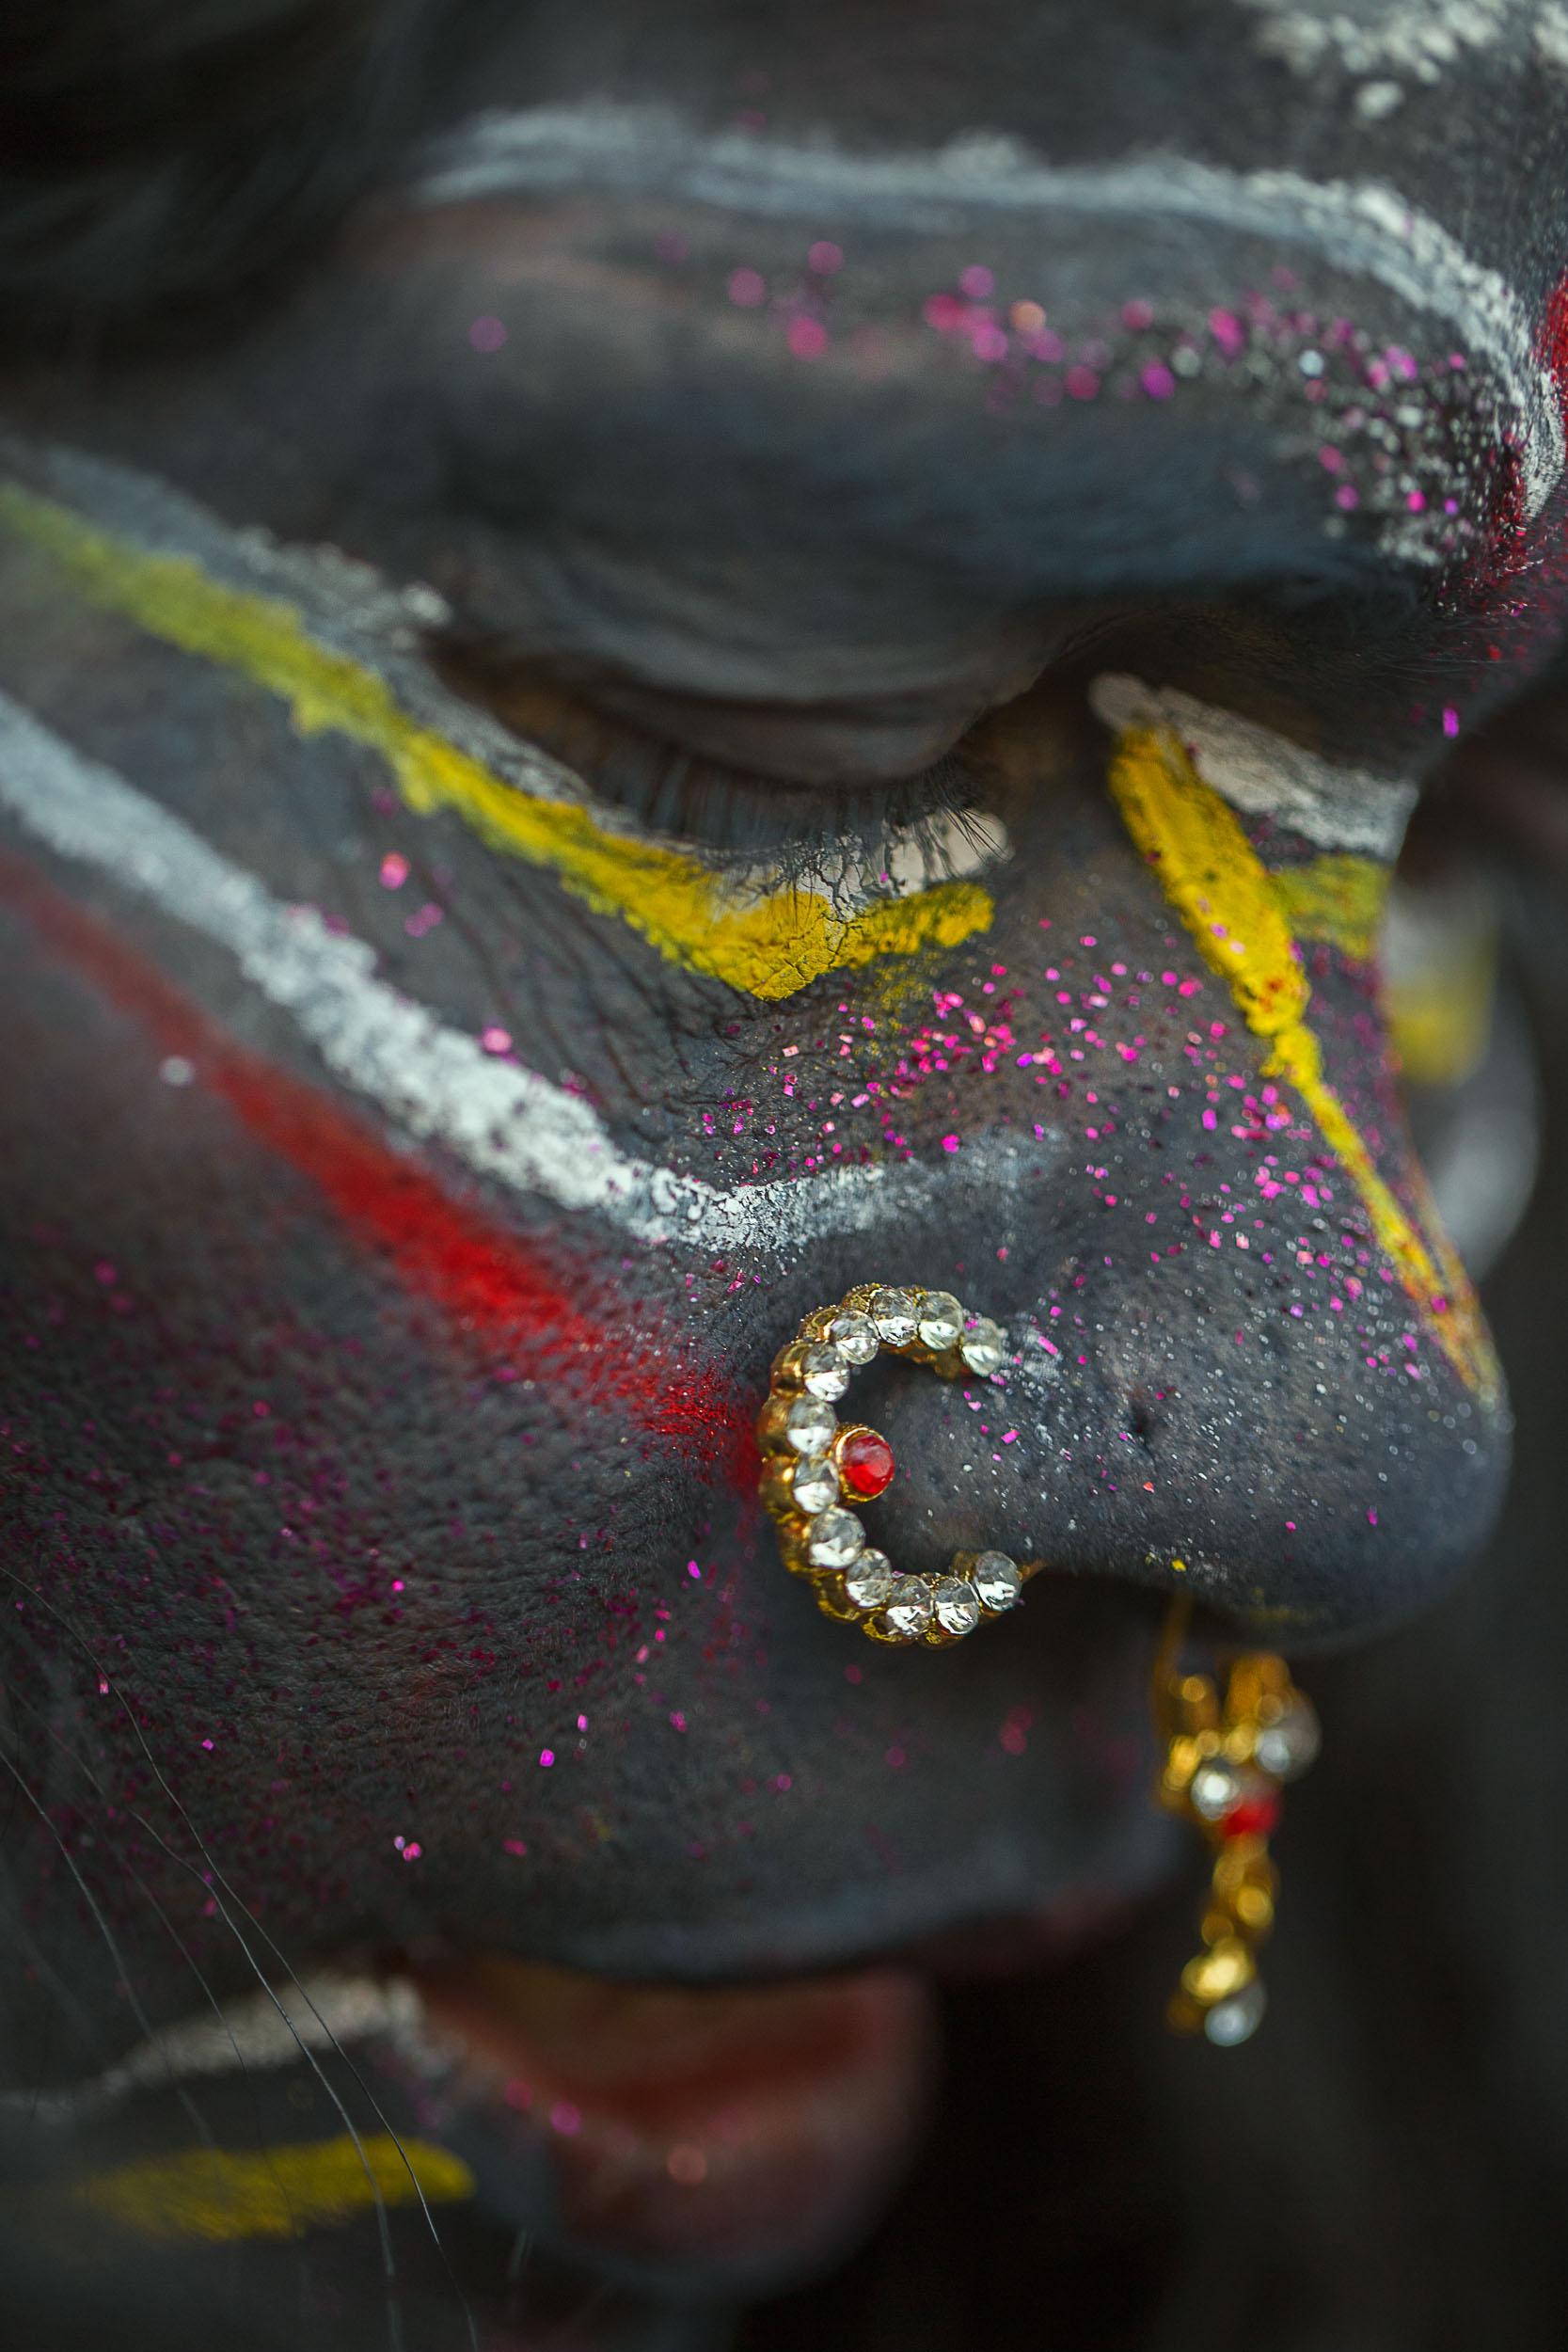 Sindhur_Photography_Travel_People_Art-84.JPG